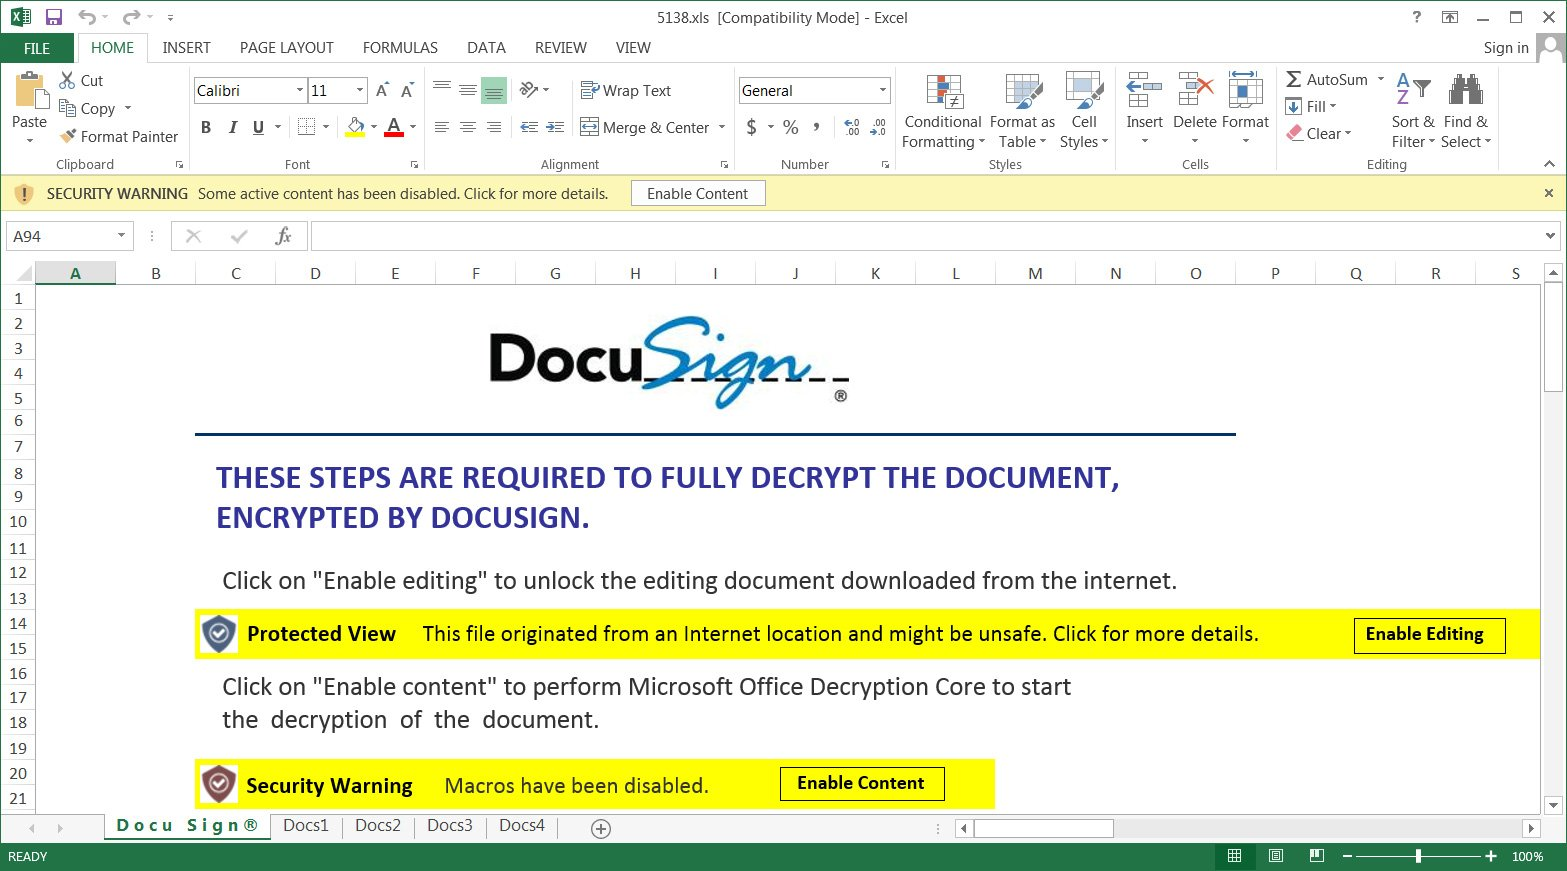 malicious-excel-document.jpg